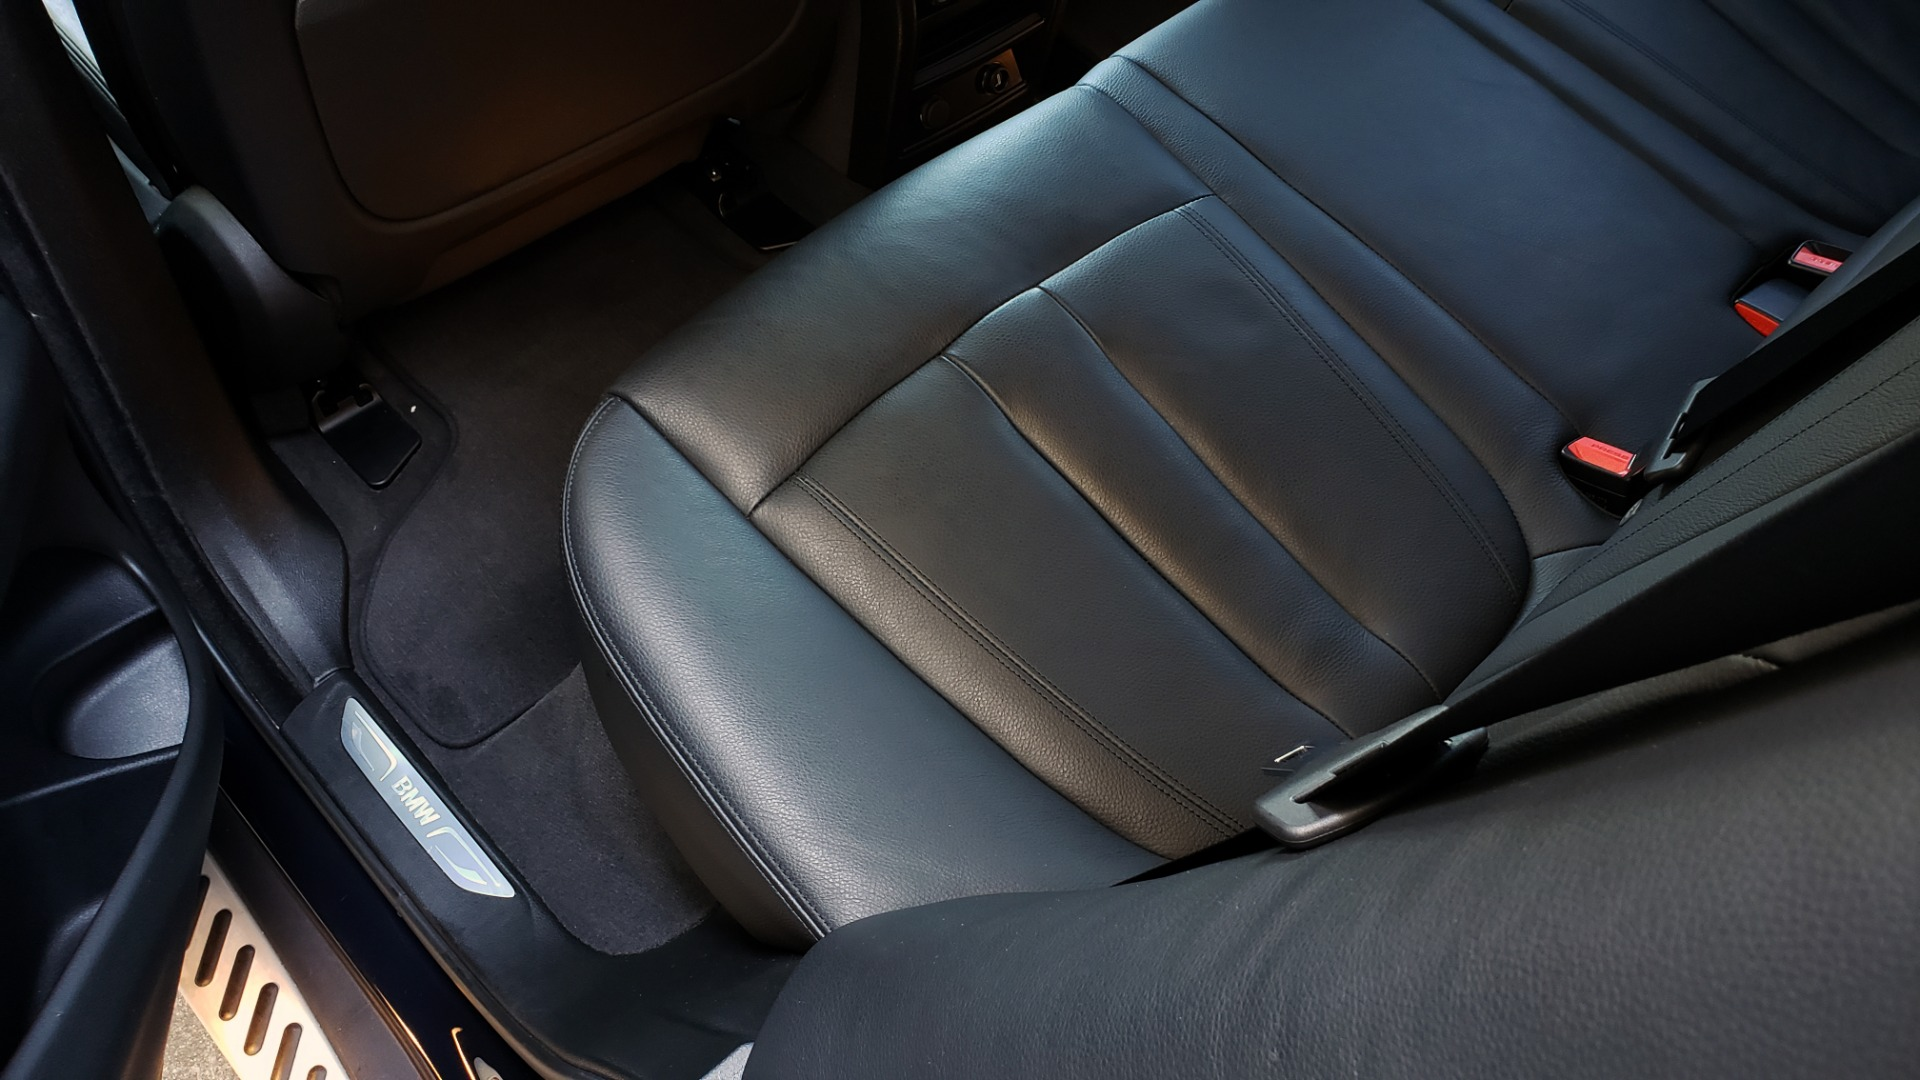 Used 2016 BMW X5 XDRIVE35I / PREM PKG / NAV / DRVR ASST PLUS / REARVIEW for sale $25,765 at Formula Imports in Charlotte NC 28227 43